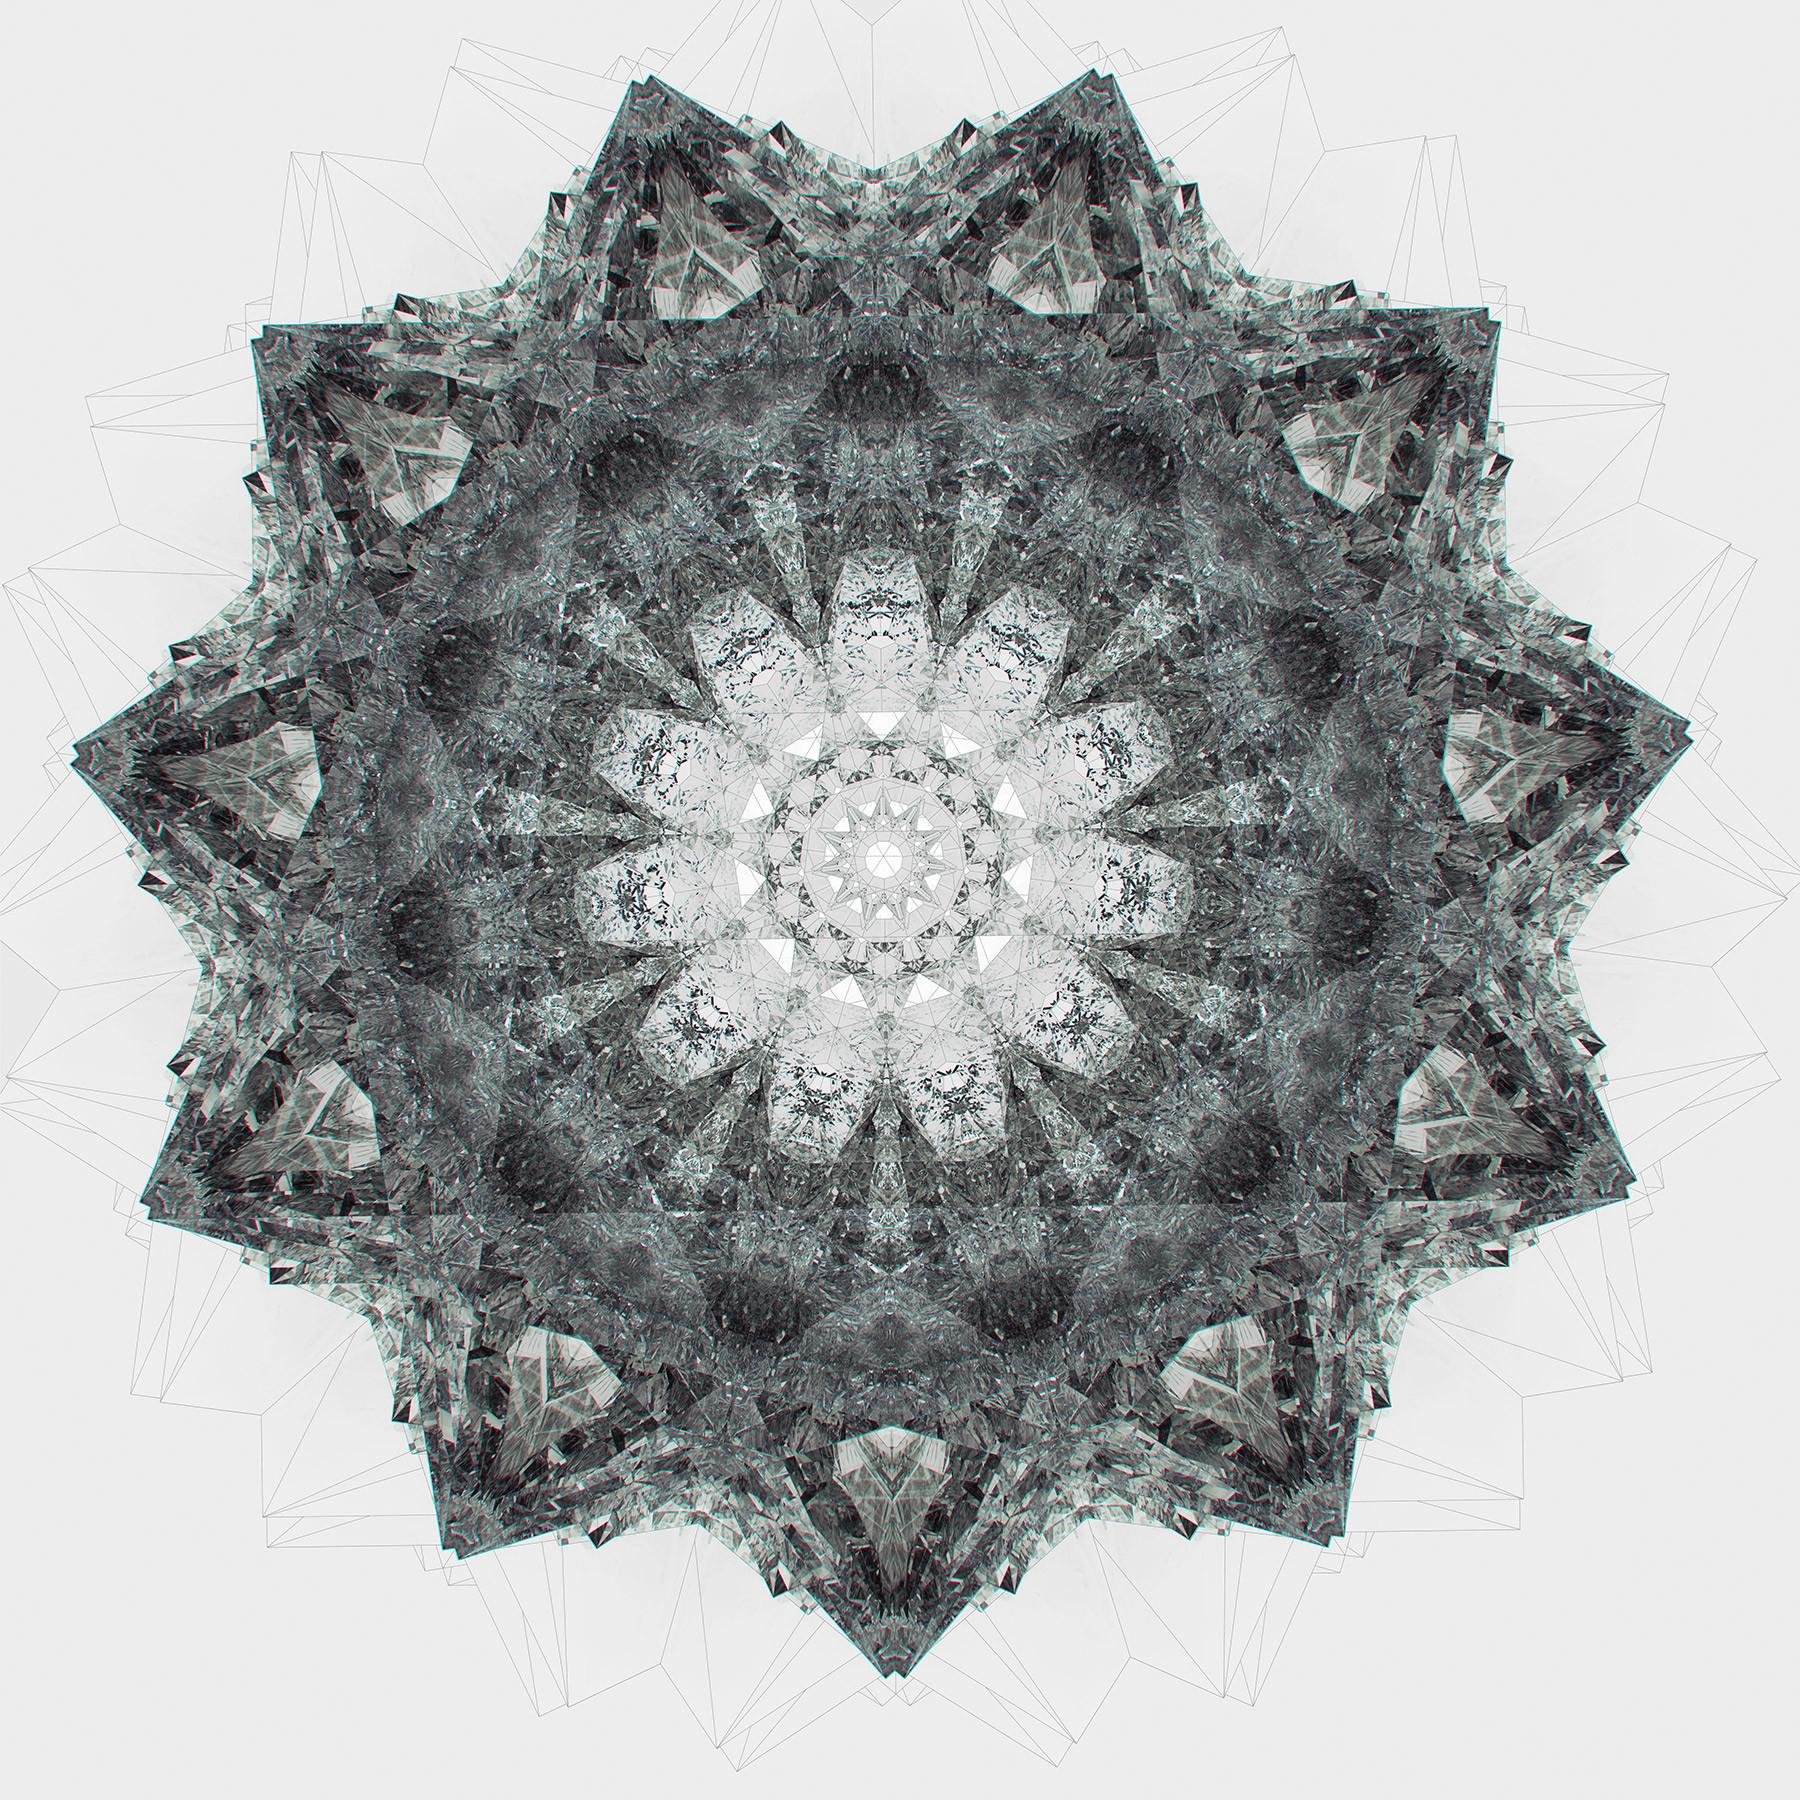 Kresimir jelusic 031115 geometry2